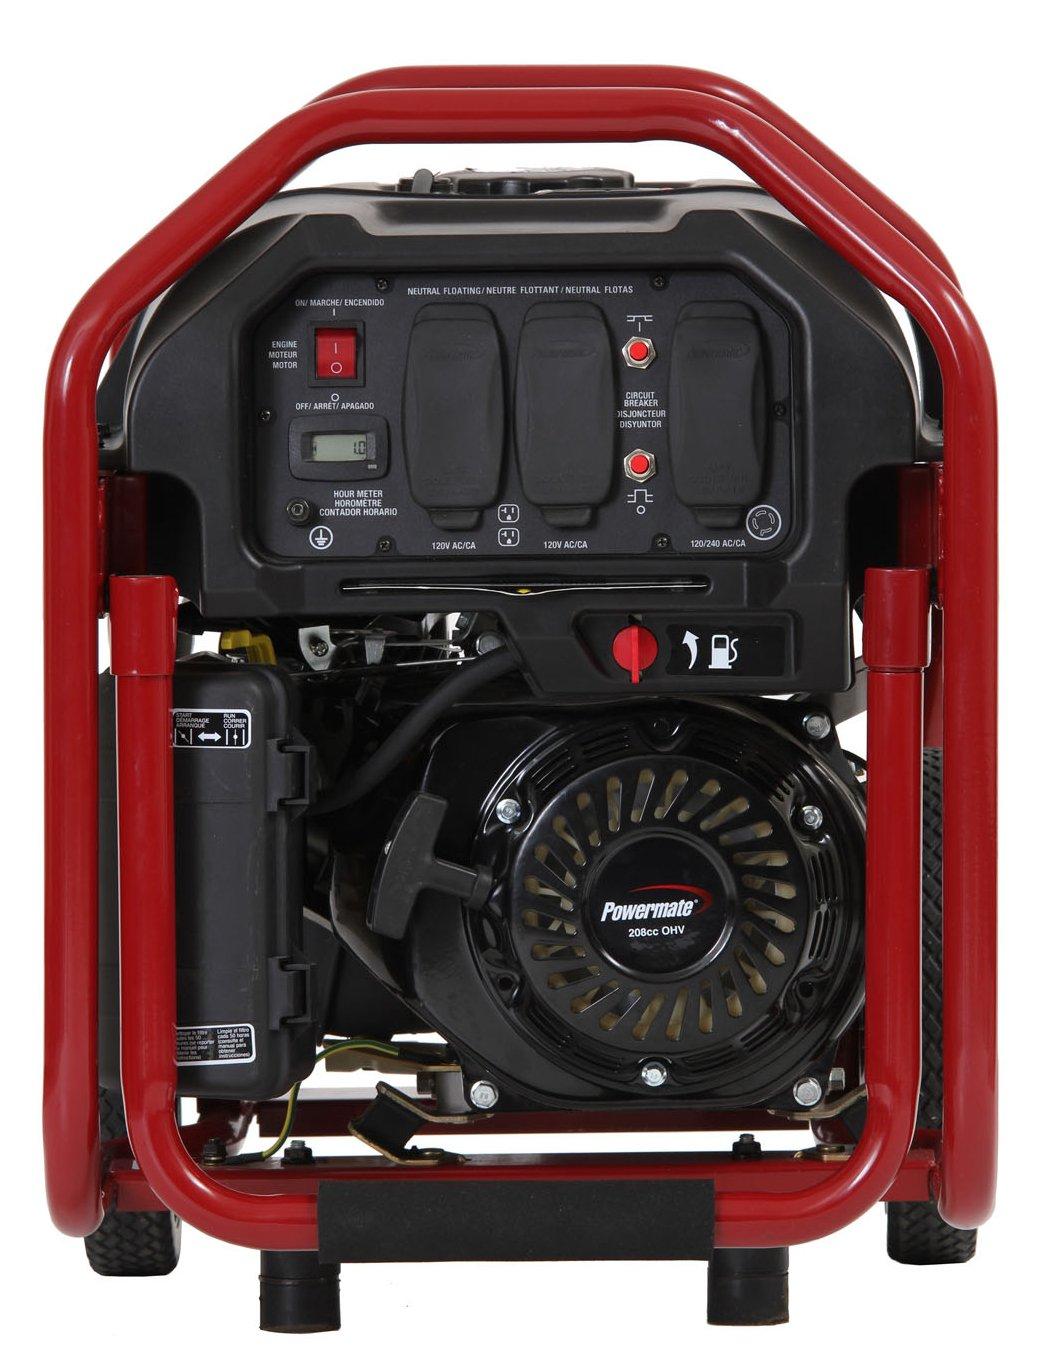 Amazon.com : Powermate PM0123250, 3250 Running Watts/4050 Starting Watts,  Gas Powered Portable Generator : Portable Power Generators : Patio, Lawn &  Garden